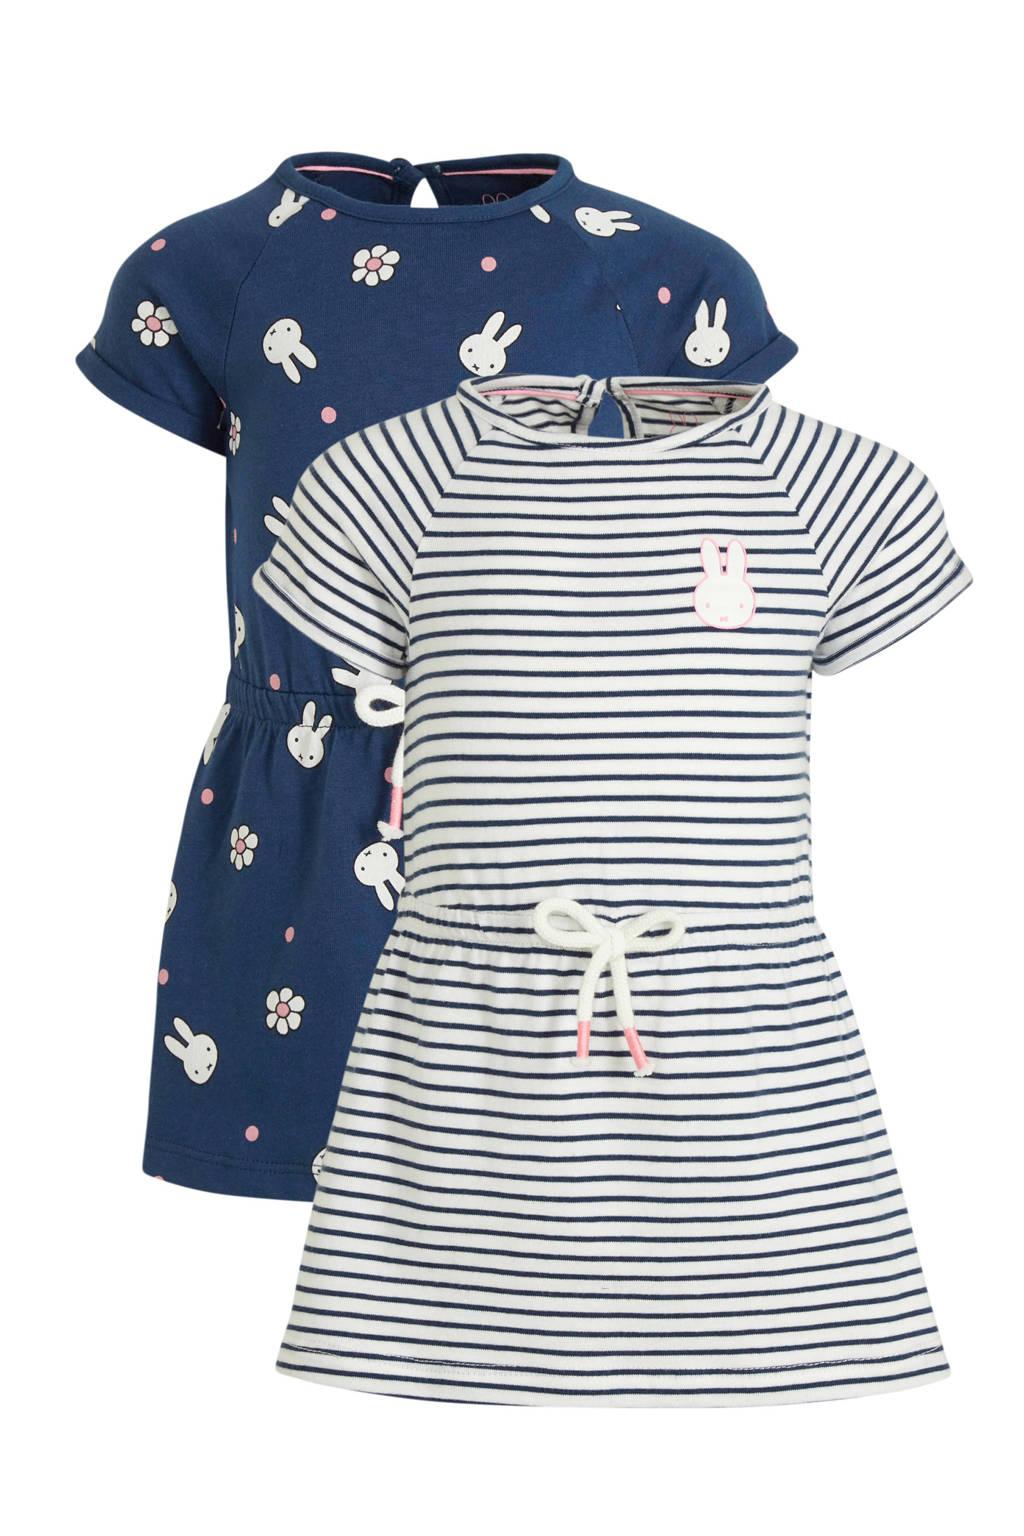 C&A jurk Nijntje - set van 2 blauw/donkerblauw, Donkerblauw